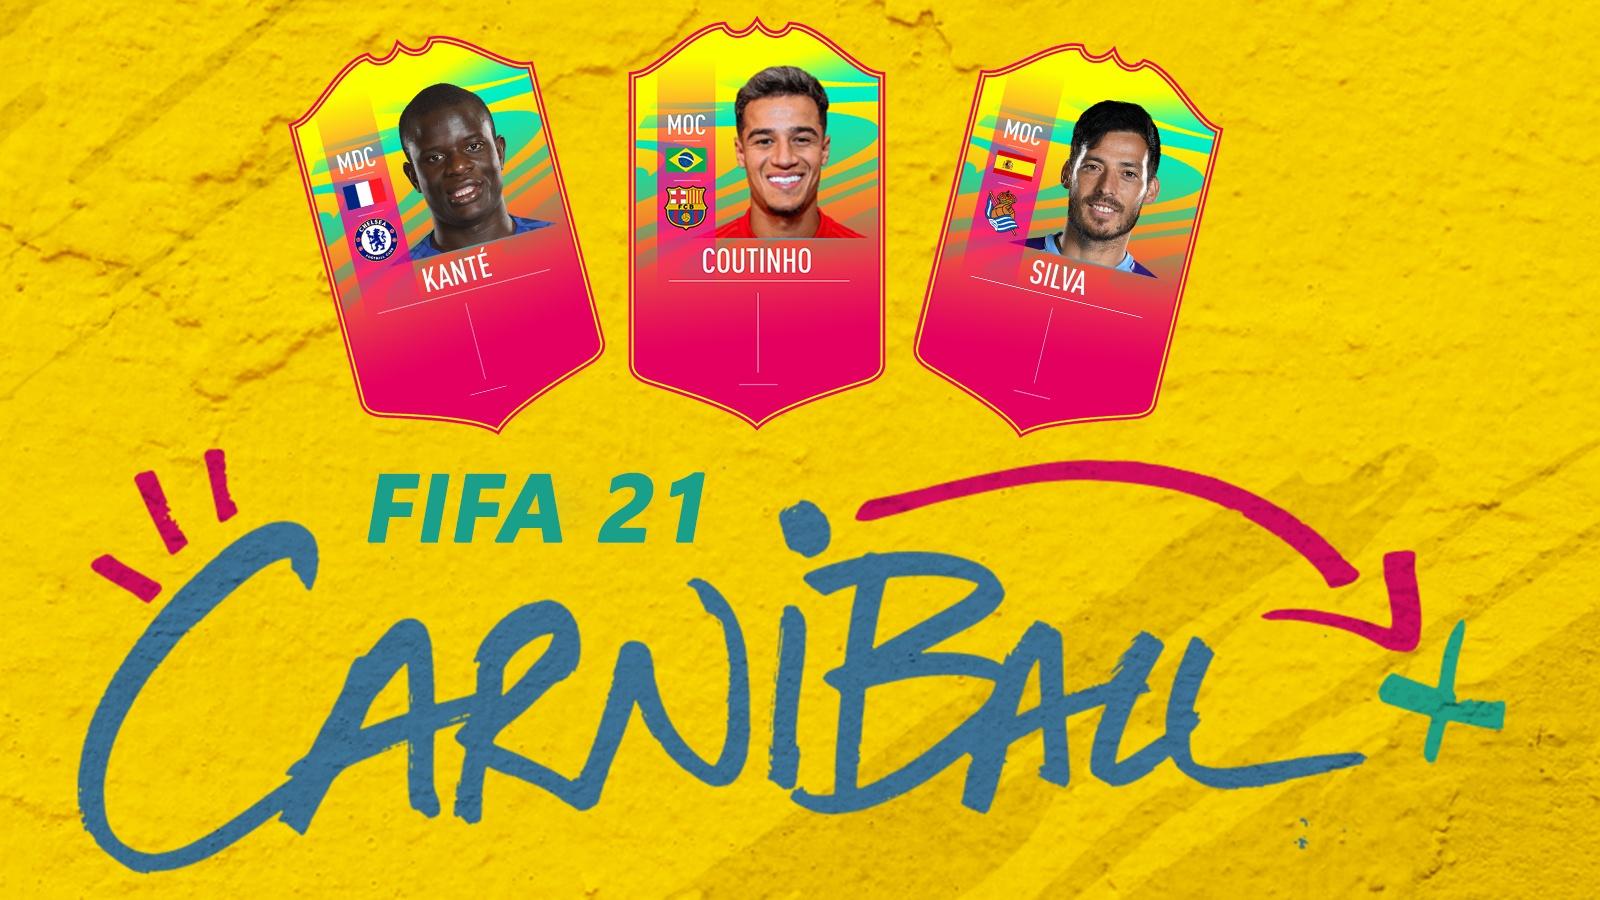 Carniball FIFA 21